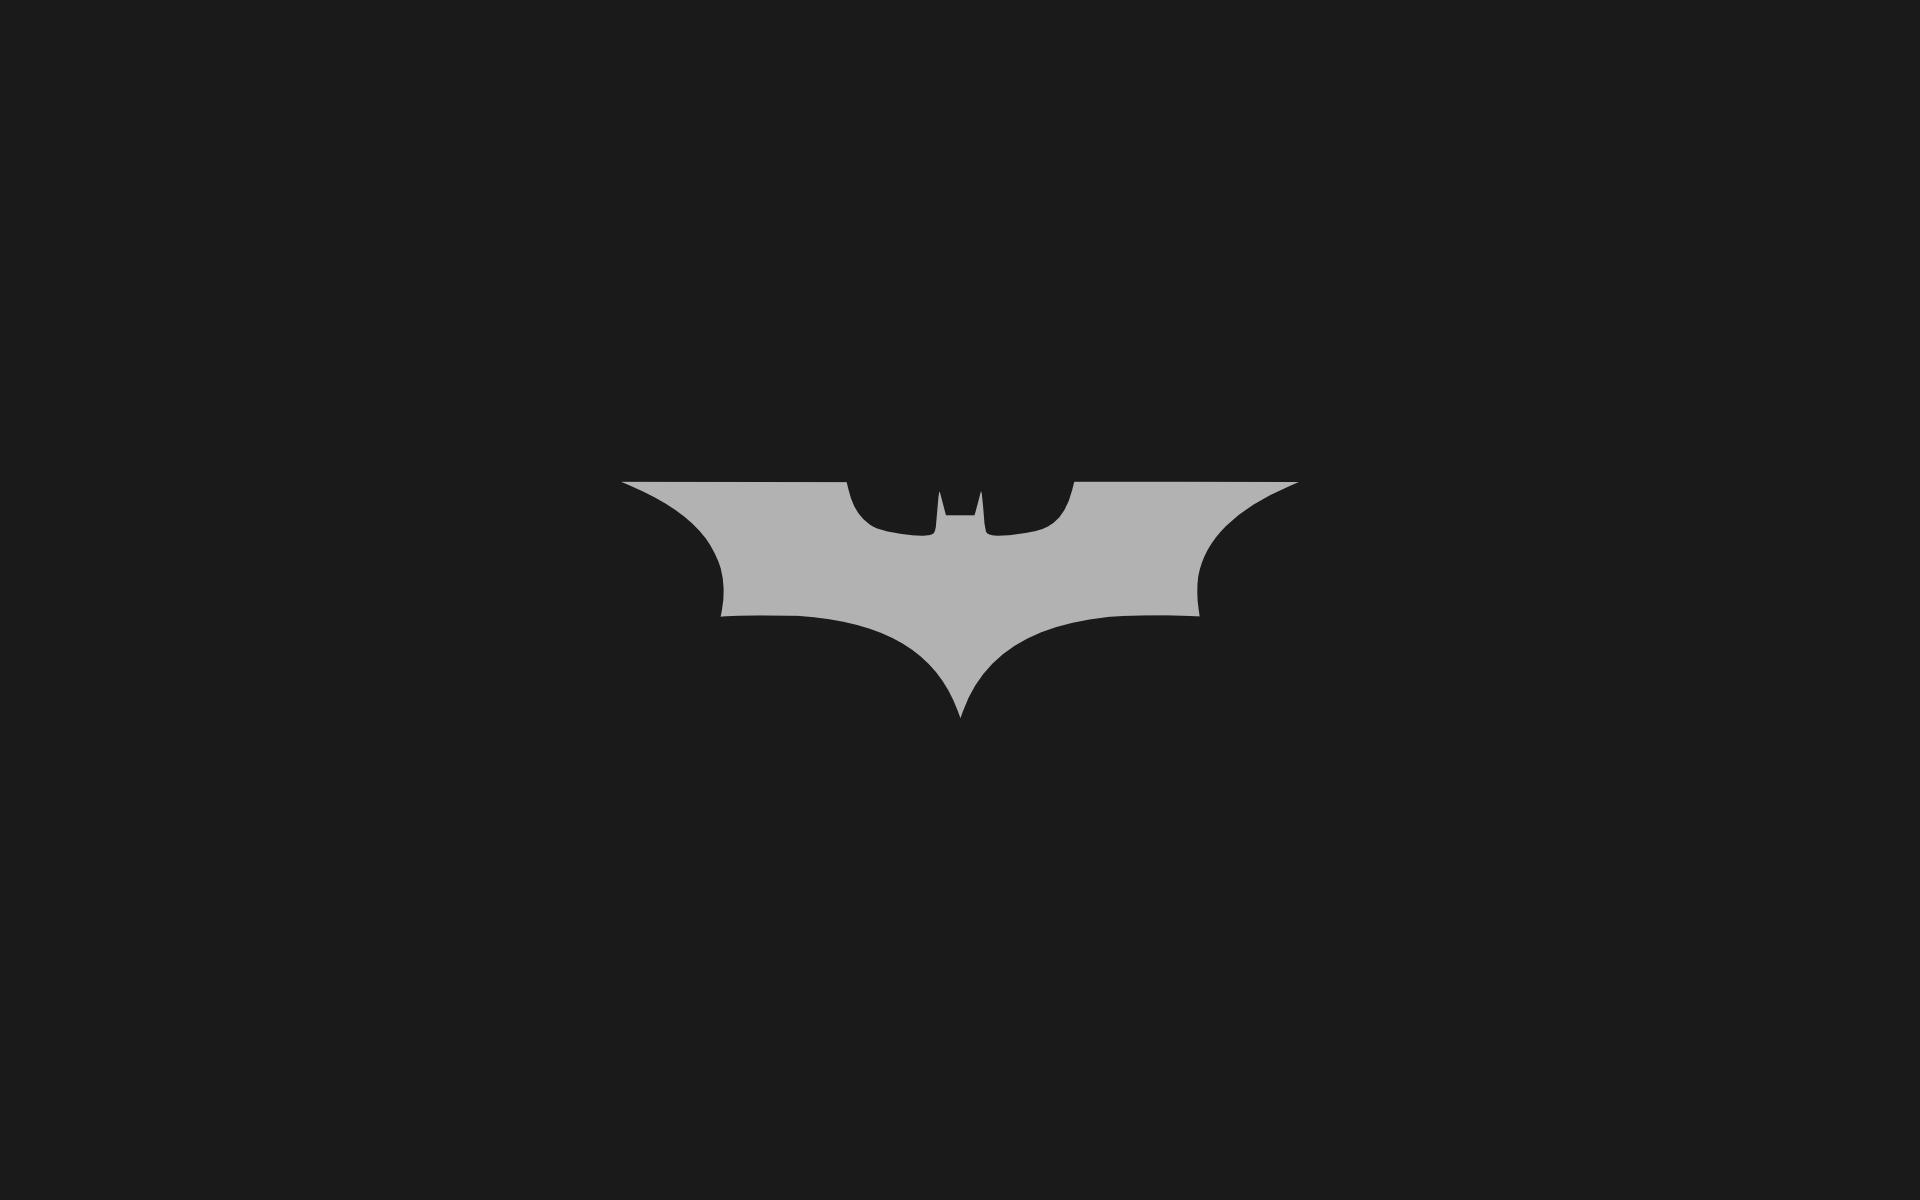 Batman Minimalist Wallpapers Wallpaper Cave